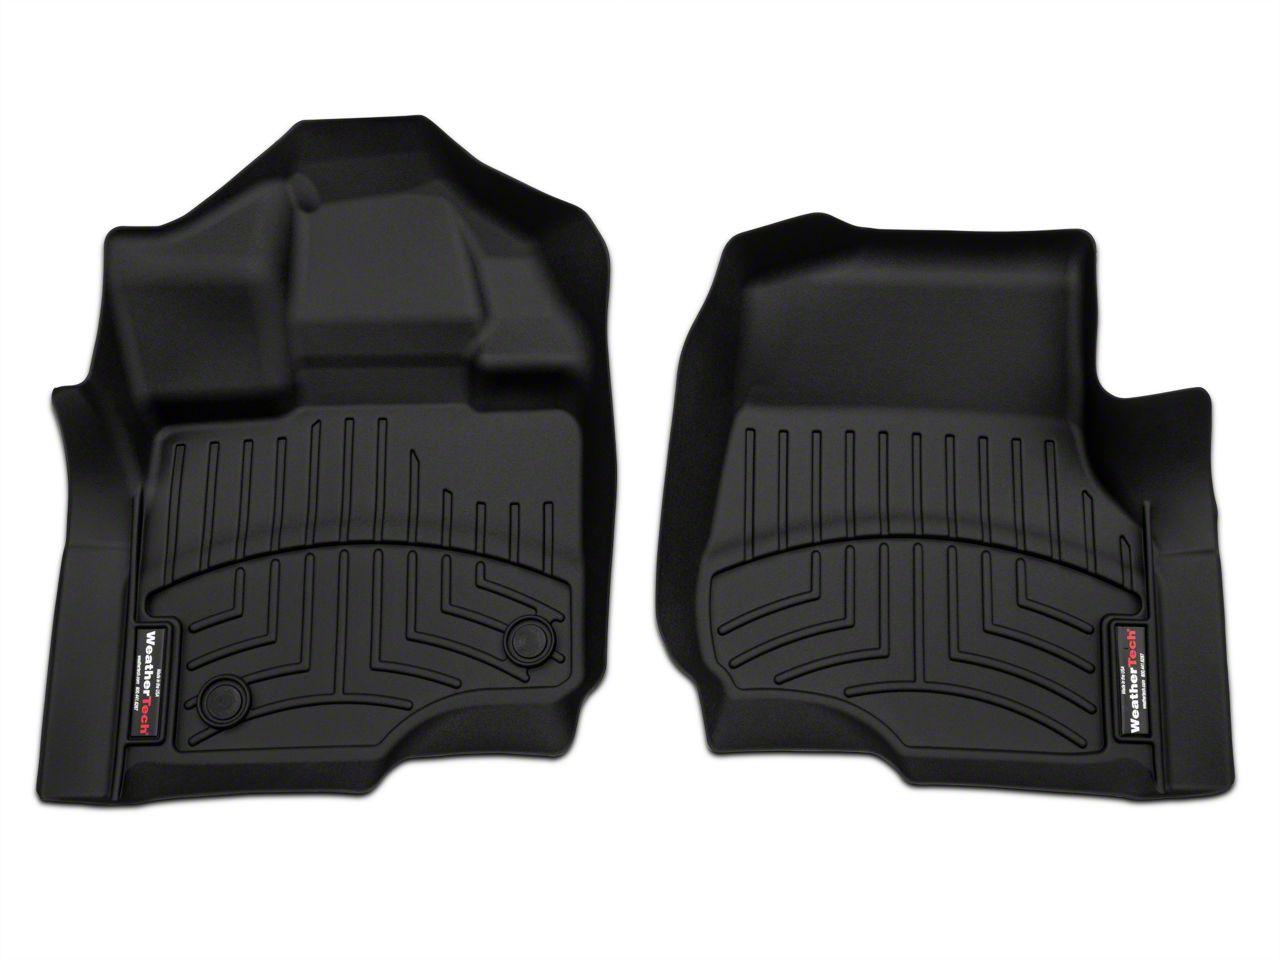 Weathertech DigitalFit Front Floor Liners - Black (15-18 F-150 SuperCab, SuperCrew)